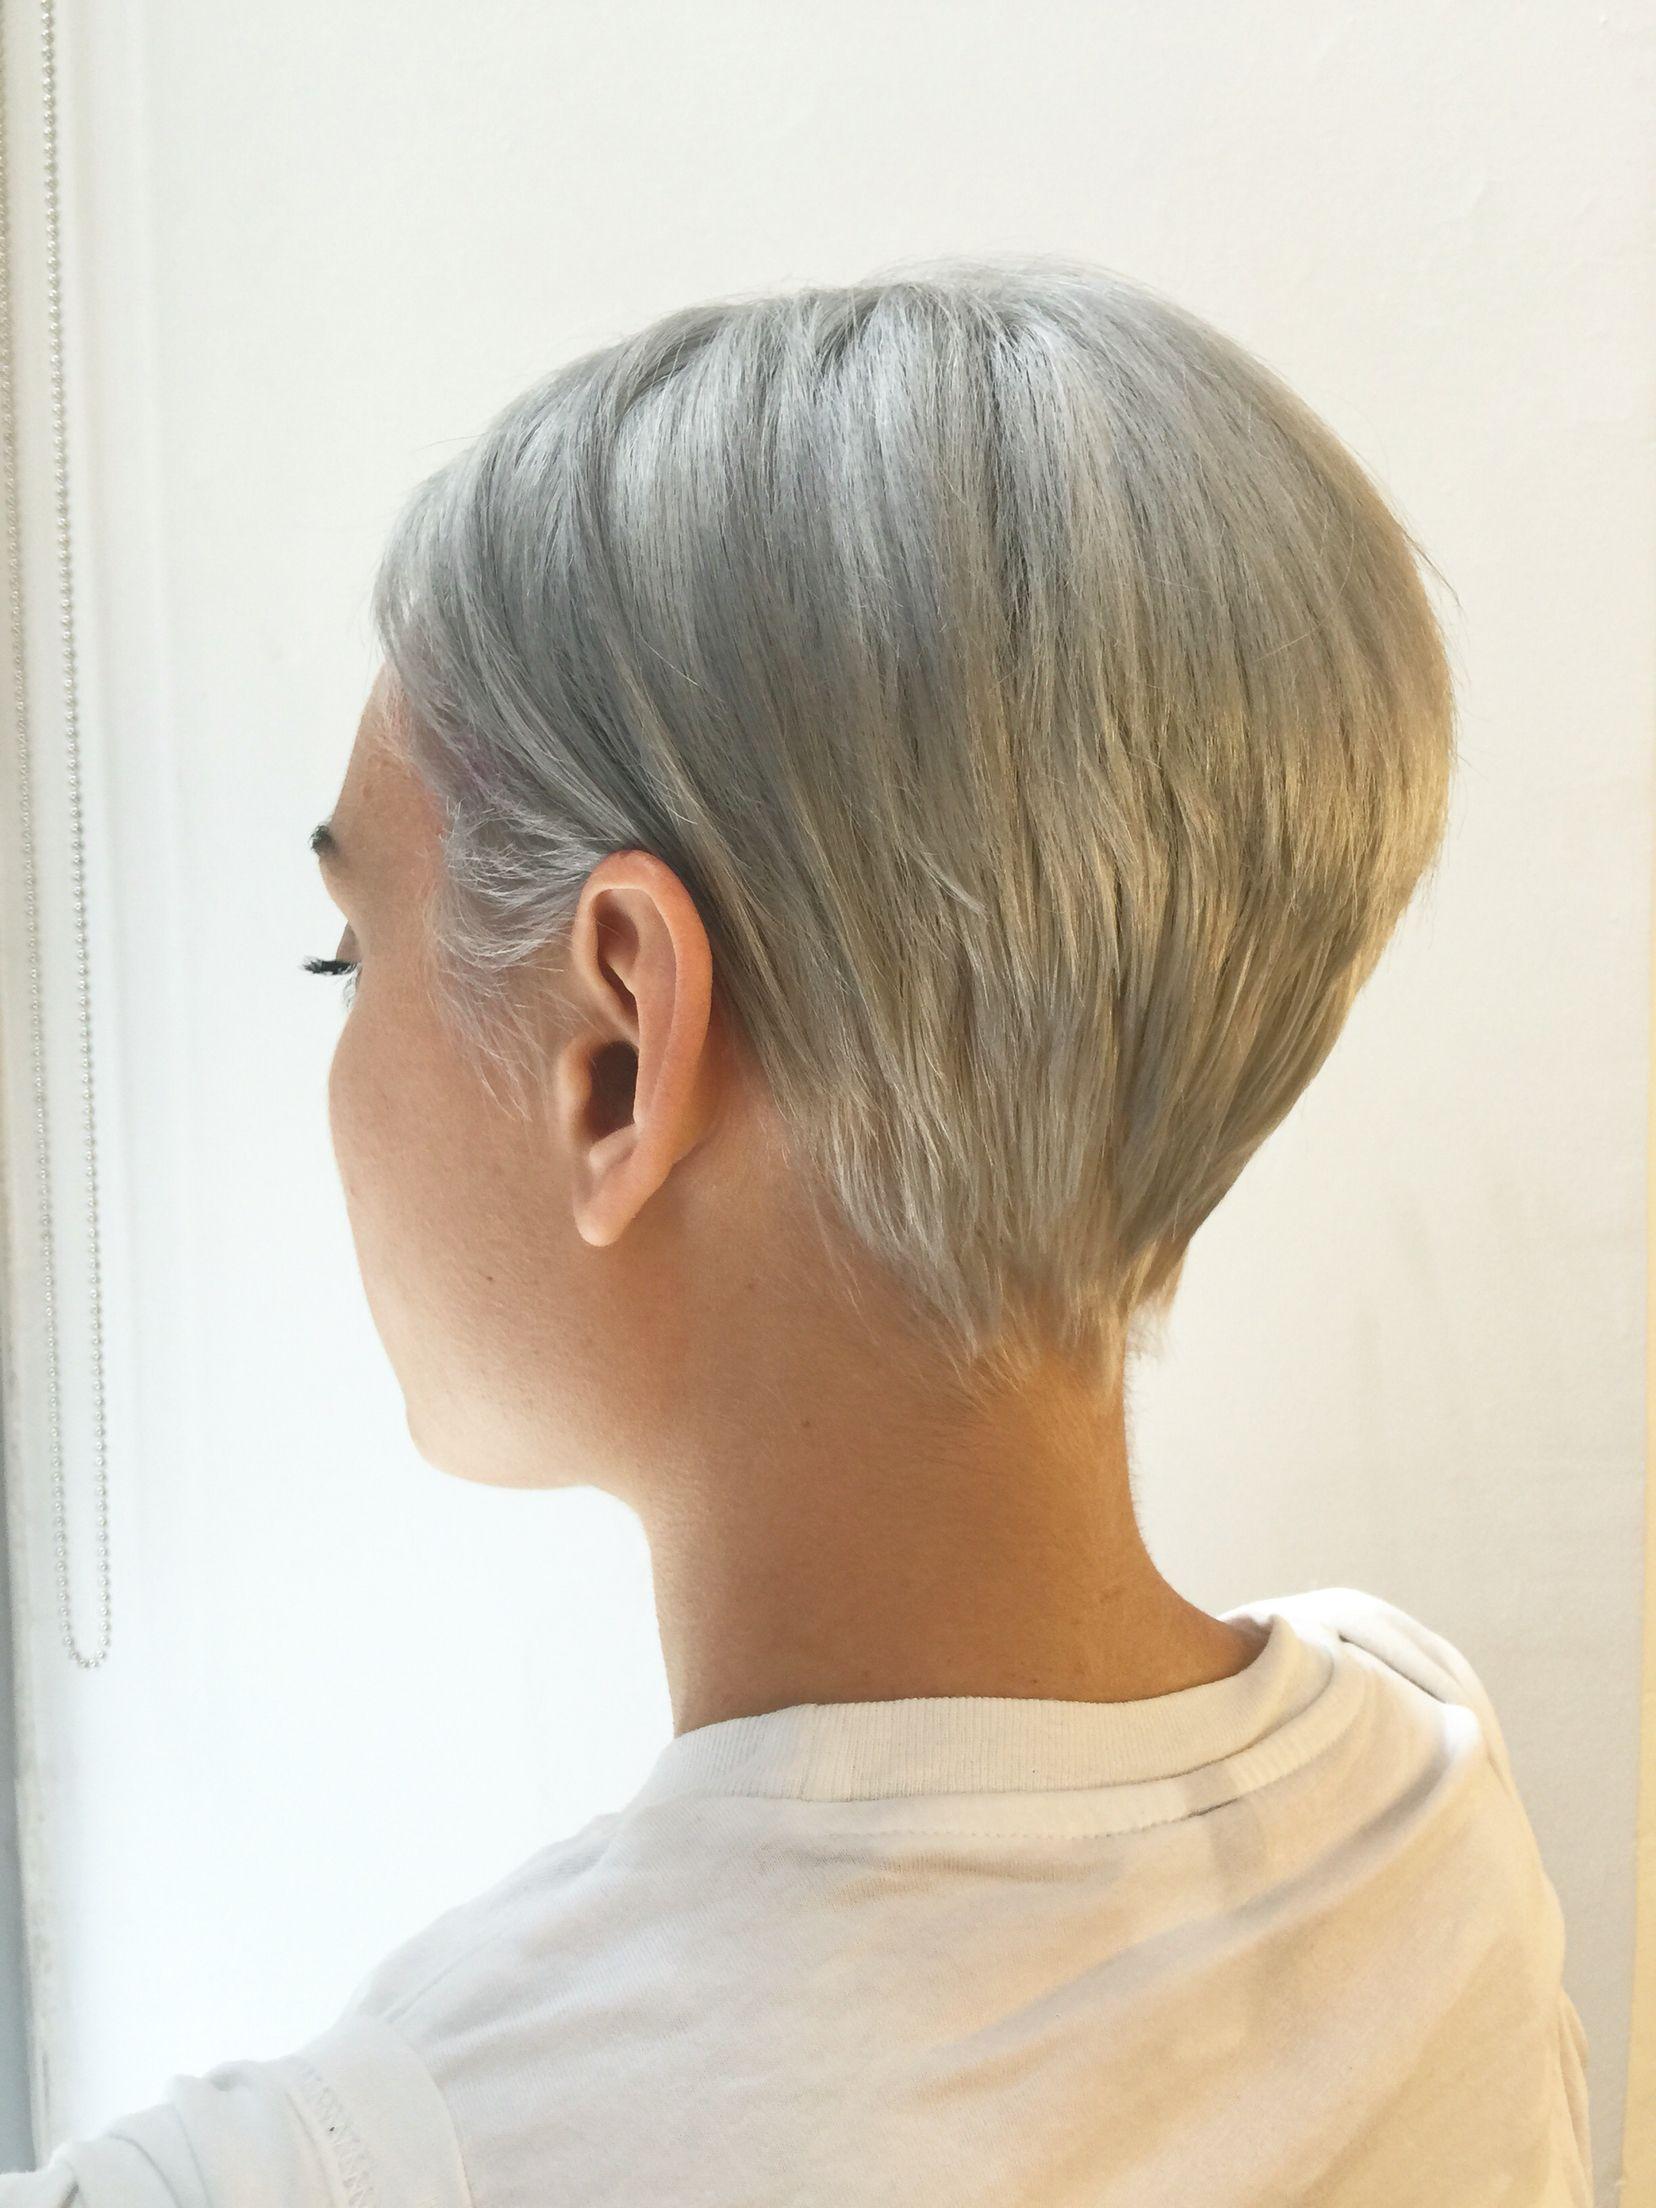 hair fine short thin hairstyles pixie bob blonde haircuts process uploaded user summer silver cuts